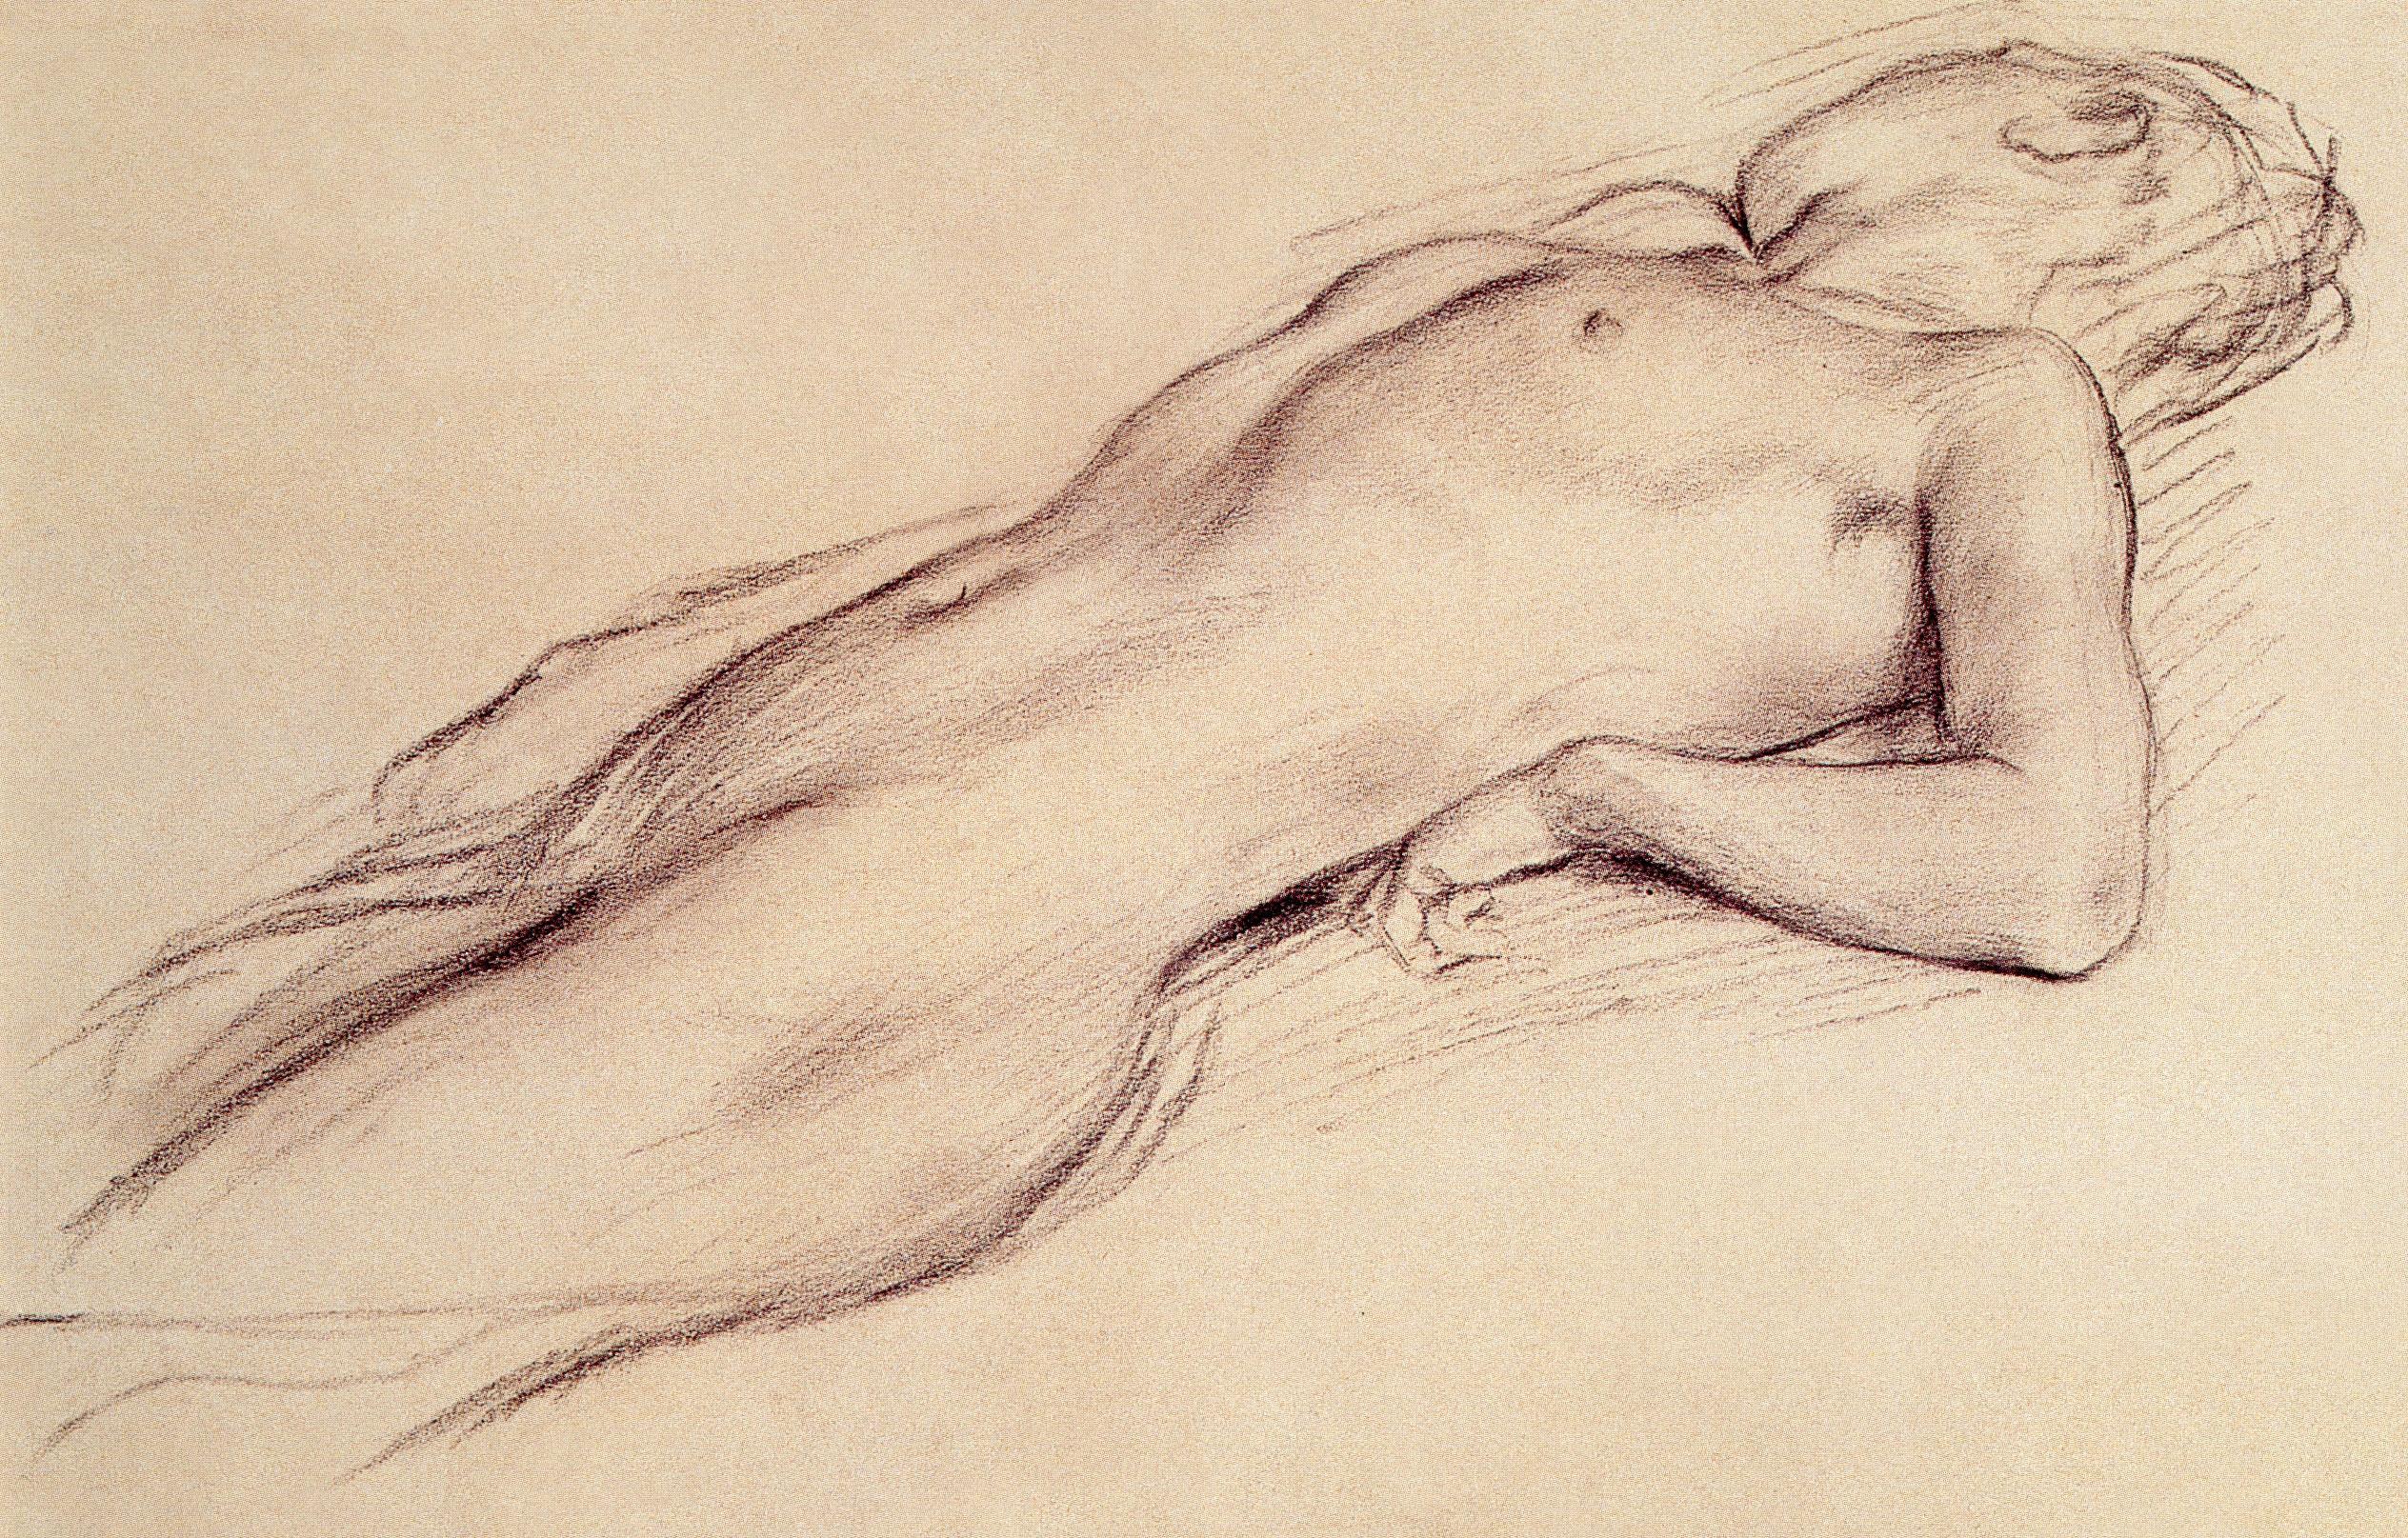 http://upload.wikimedia.org/wikipedia/commons/c/c0/Degas-Femme-nue-%C3%A9tendue.jpg